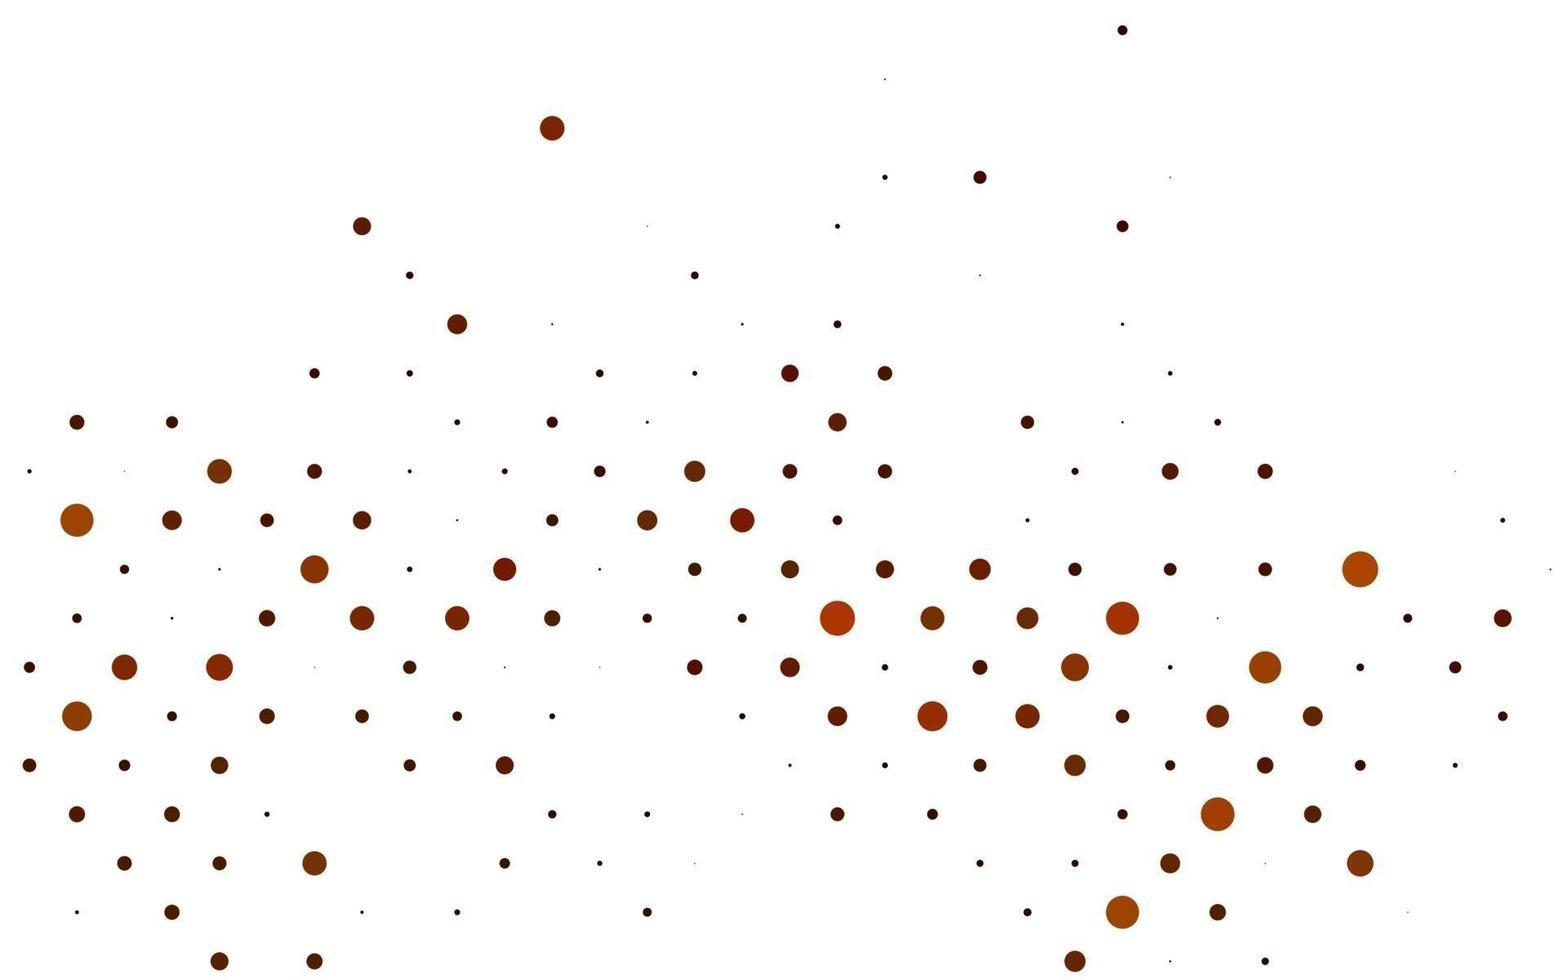 layout de vetor amarelo e laranja claro com formas de círculo.